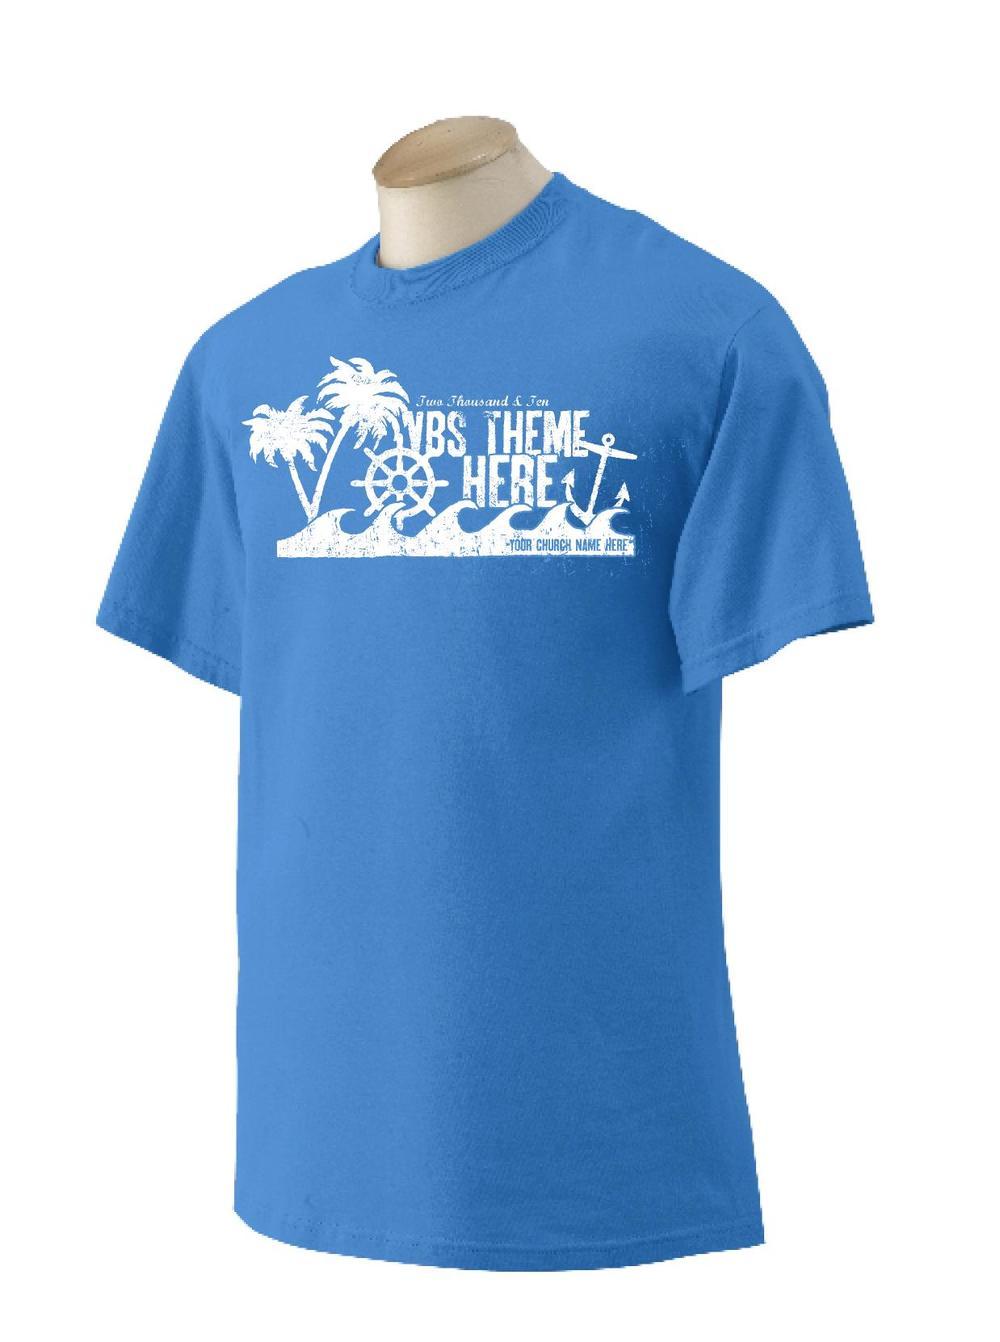 ocean 1 iris shirt.jpg